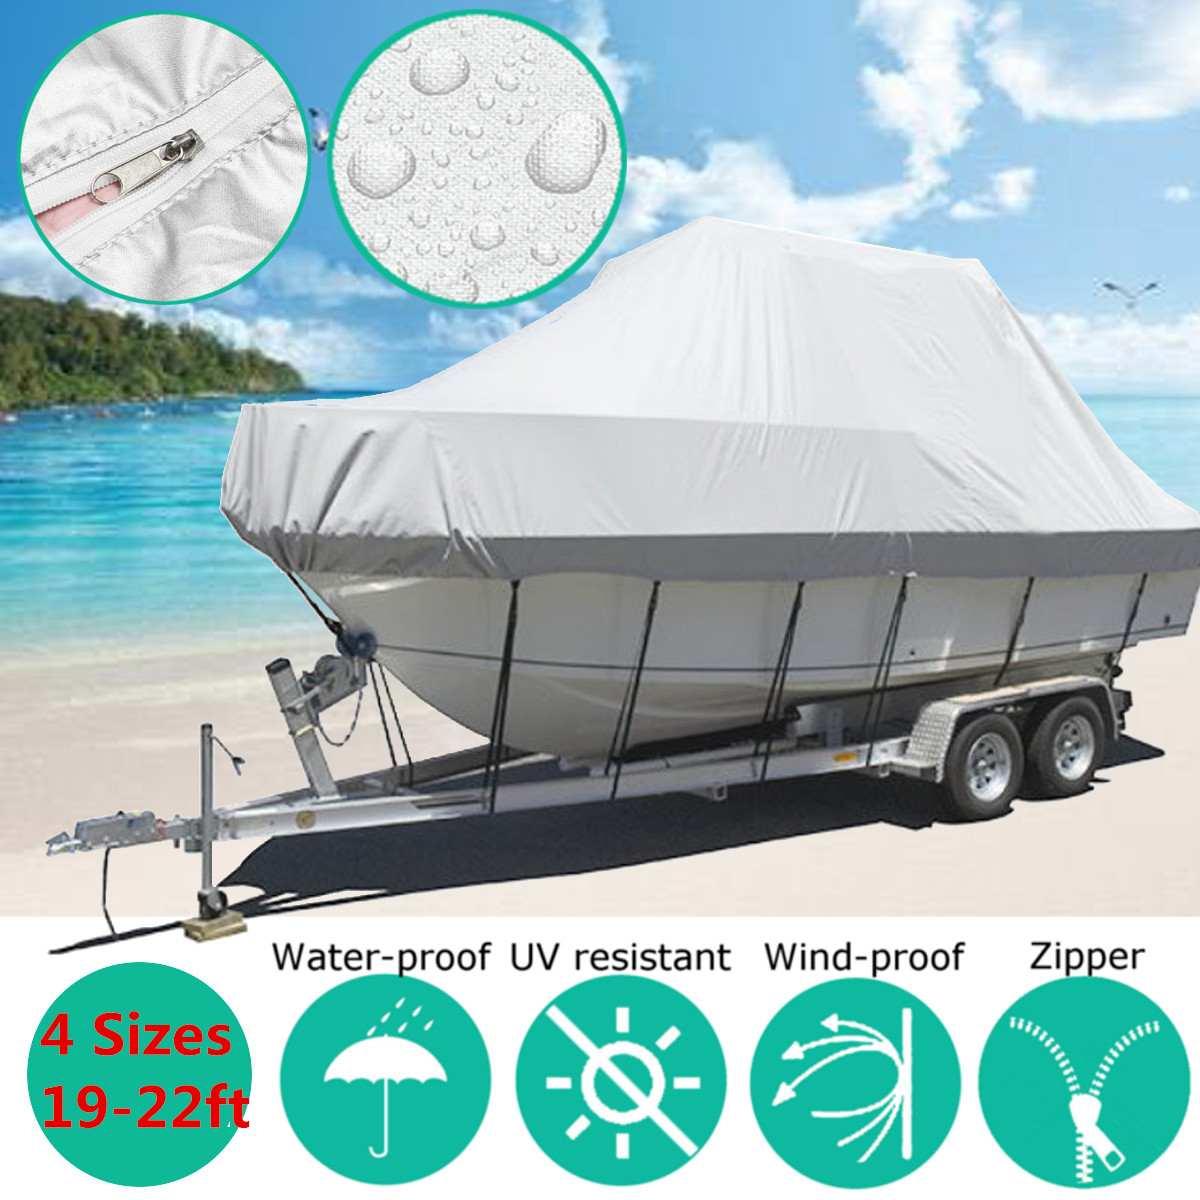 22-19ft 6.7-5.8m Boat Cover Marine Boat Yacht New Design Premium Heavy Duty 600D Trailerable Jumbo Boat Cover